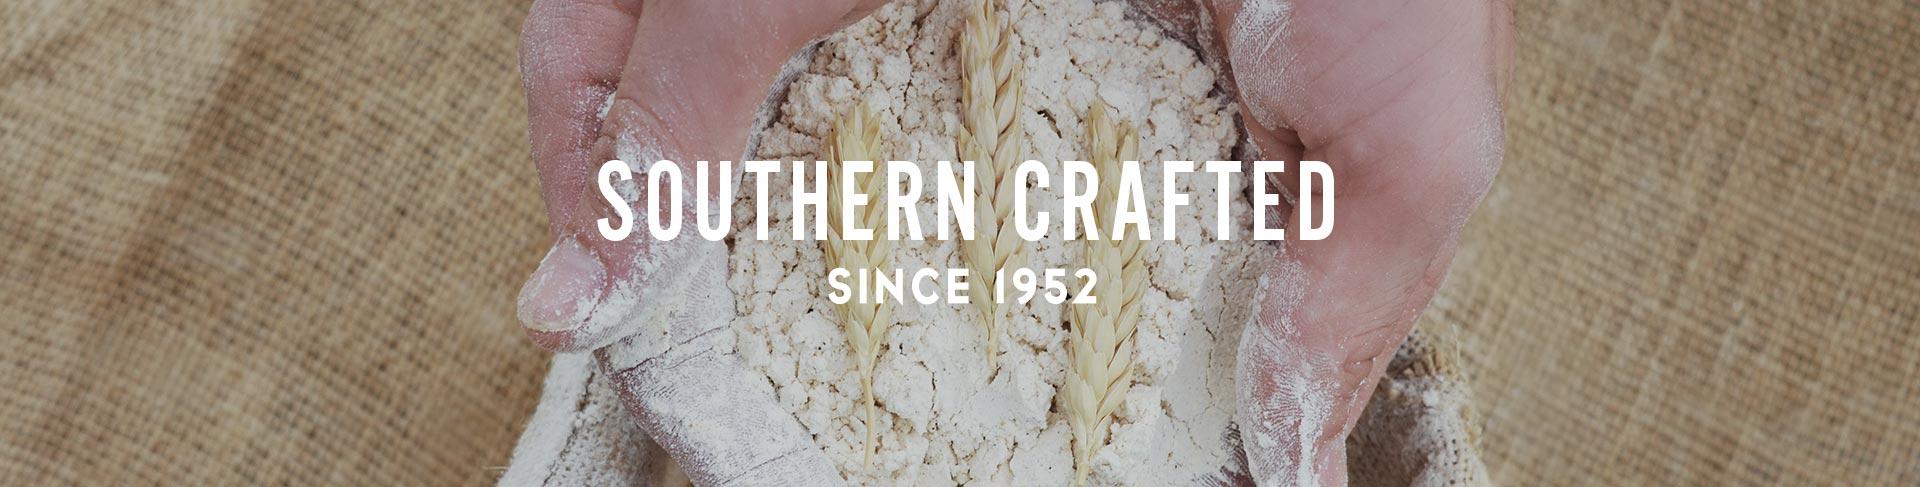 Wynn's Grain and Spice